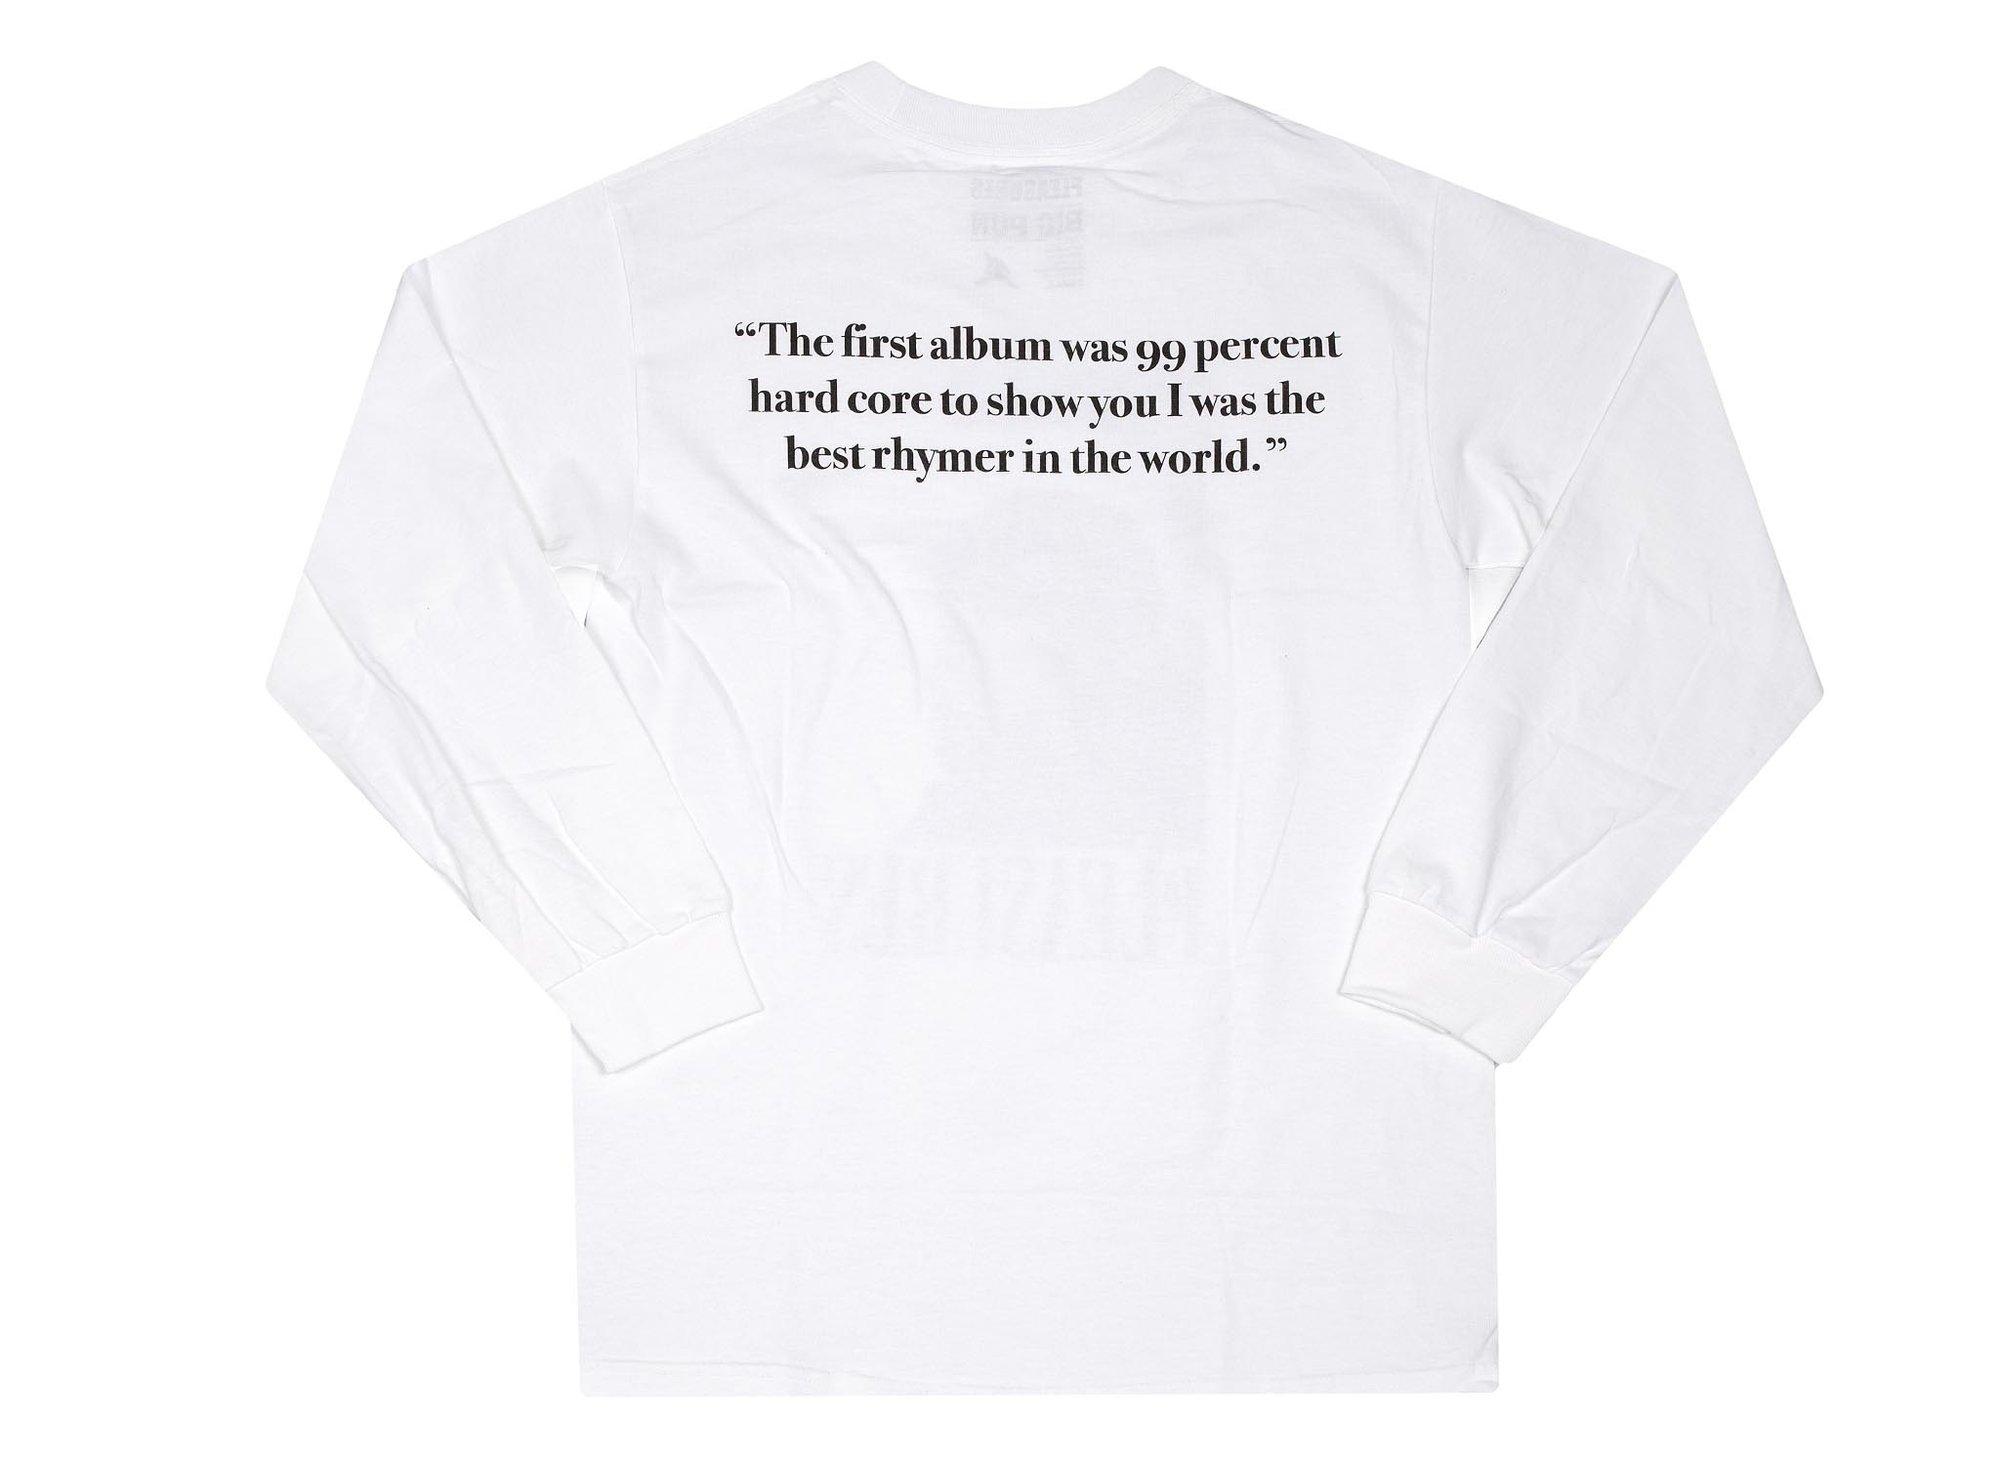 【PLEASURES/プレジャーズ×BIG PUN/ビッグ・パン】BEWARE LONG SLEEVE ロングTシャツ / WHITE